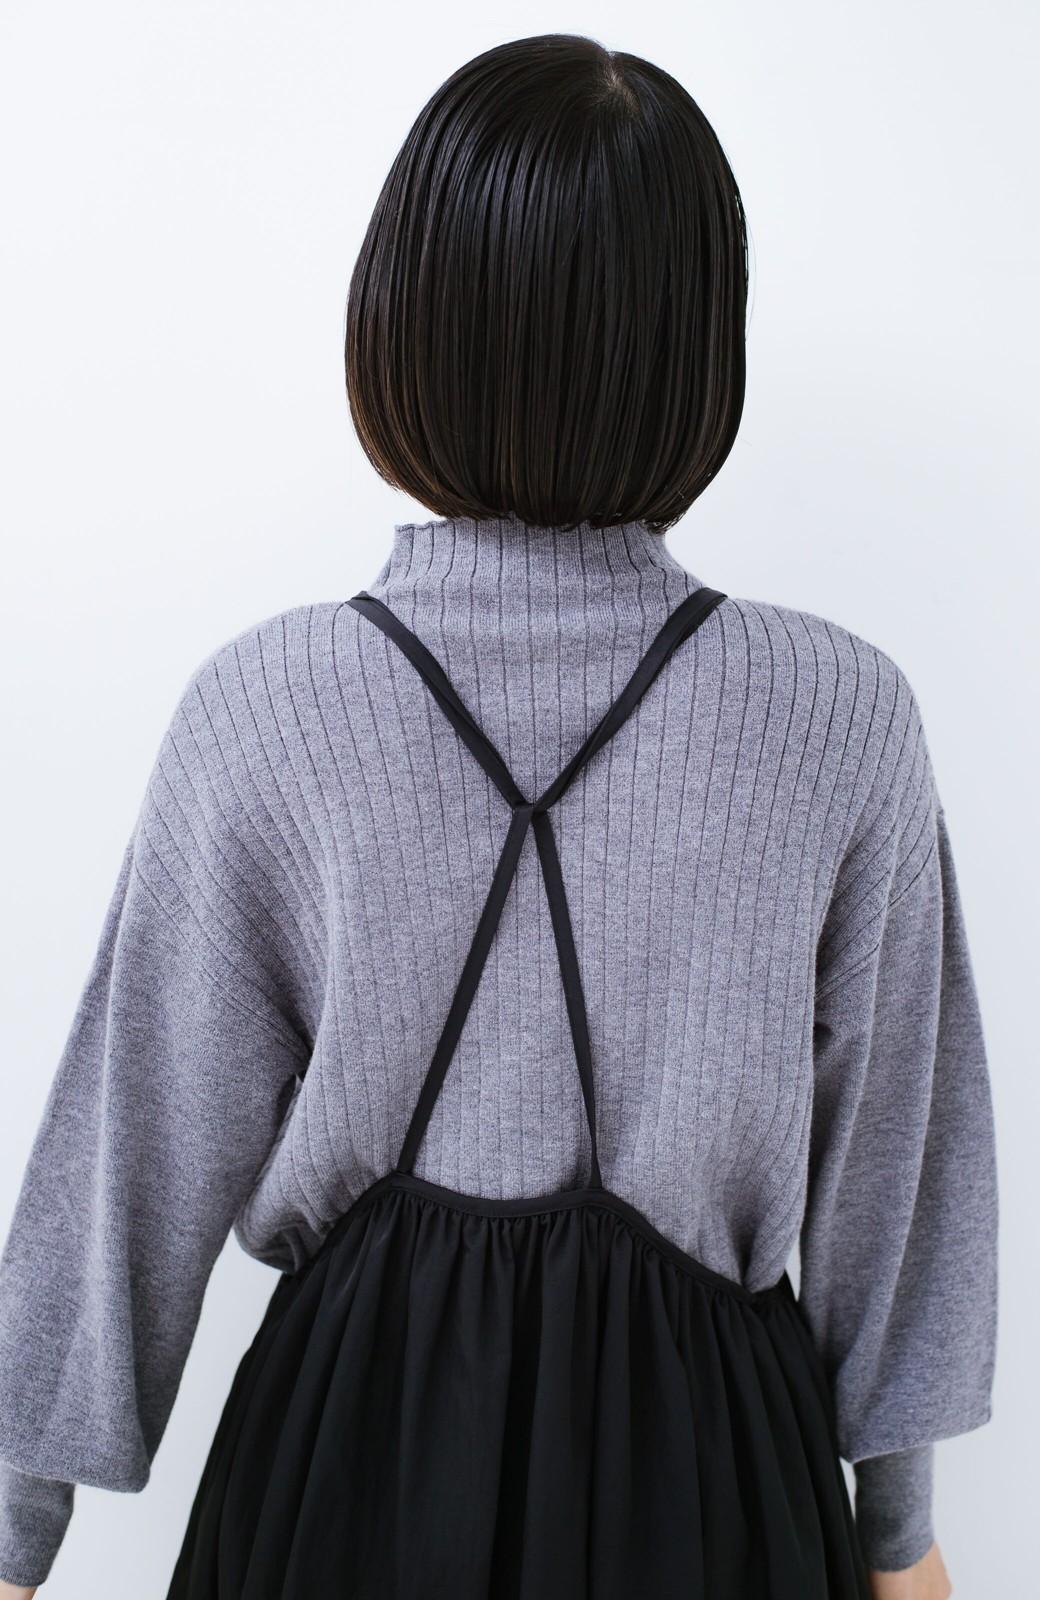 haco! 女の子バンザイ!プロジェクト【ブルー期】 ニットですら重ね着できる安心さ ゆったりギャザーキャミワンピ <ブラック>の商品写真20